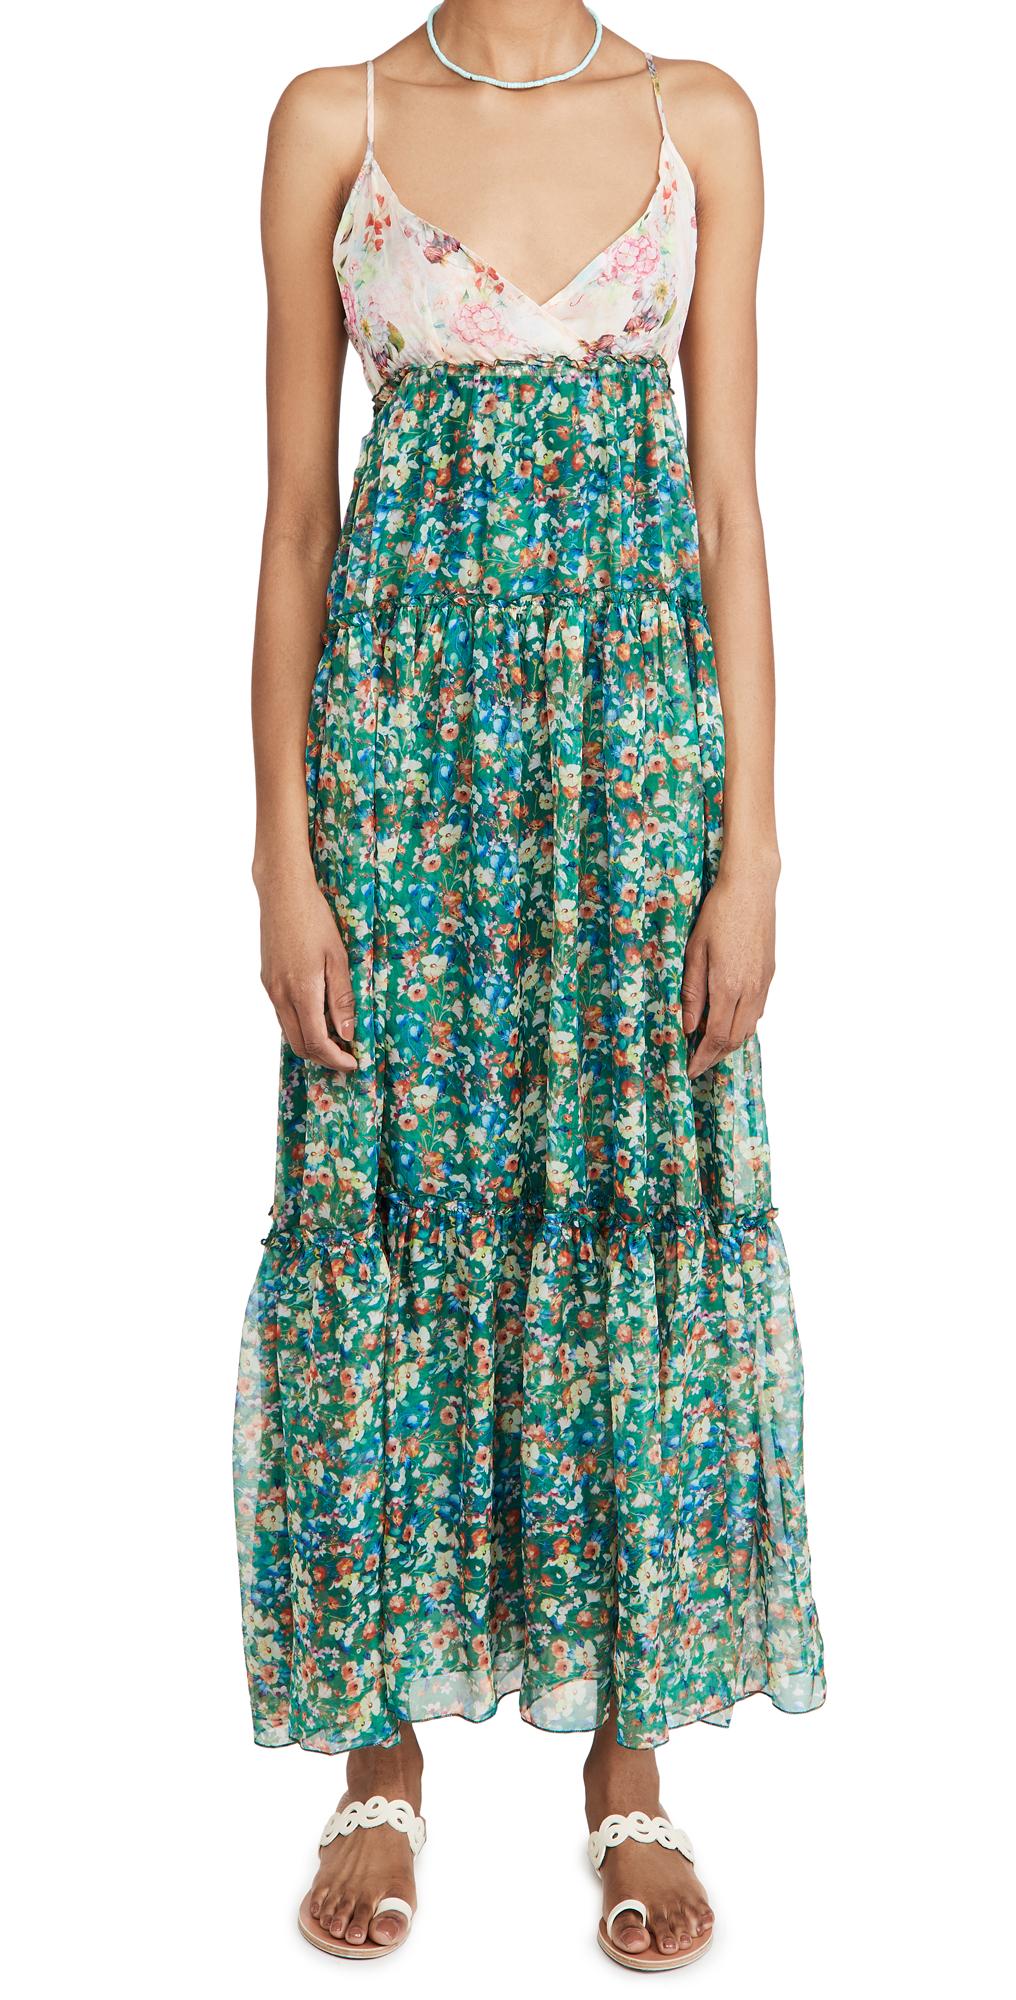 Eywasouls Malibu Olivia Dress